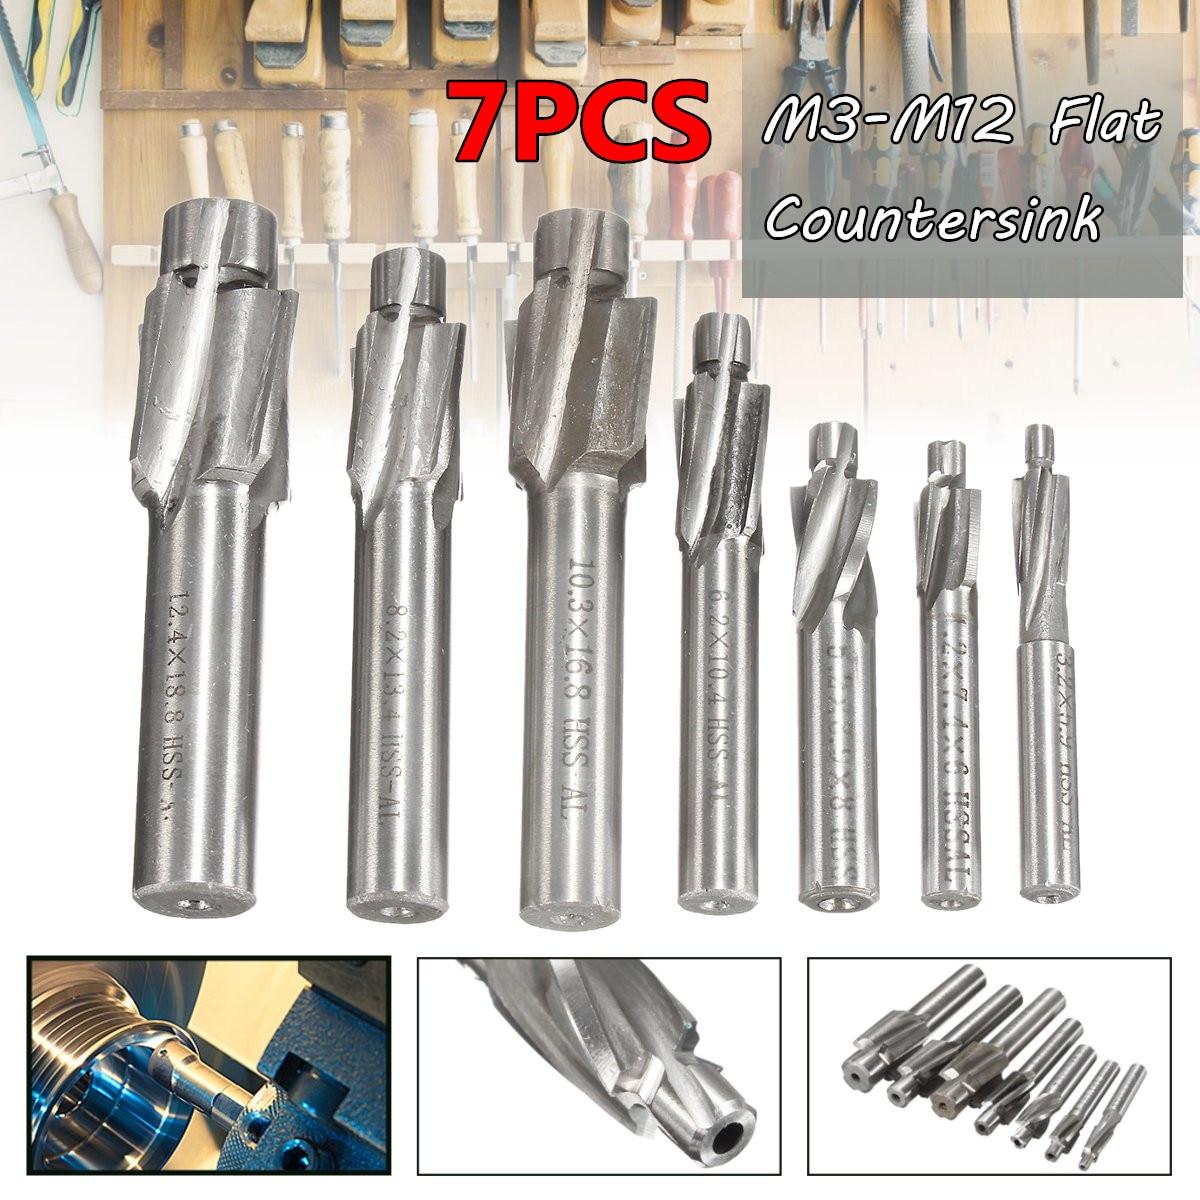 7 Piece Set HSS Flat Countersink  End Milling Cutter Drill Bits Set Sunk Head Milling Cutter Countersunk Drill M3-M12